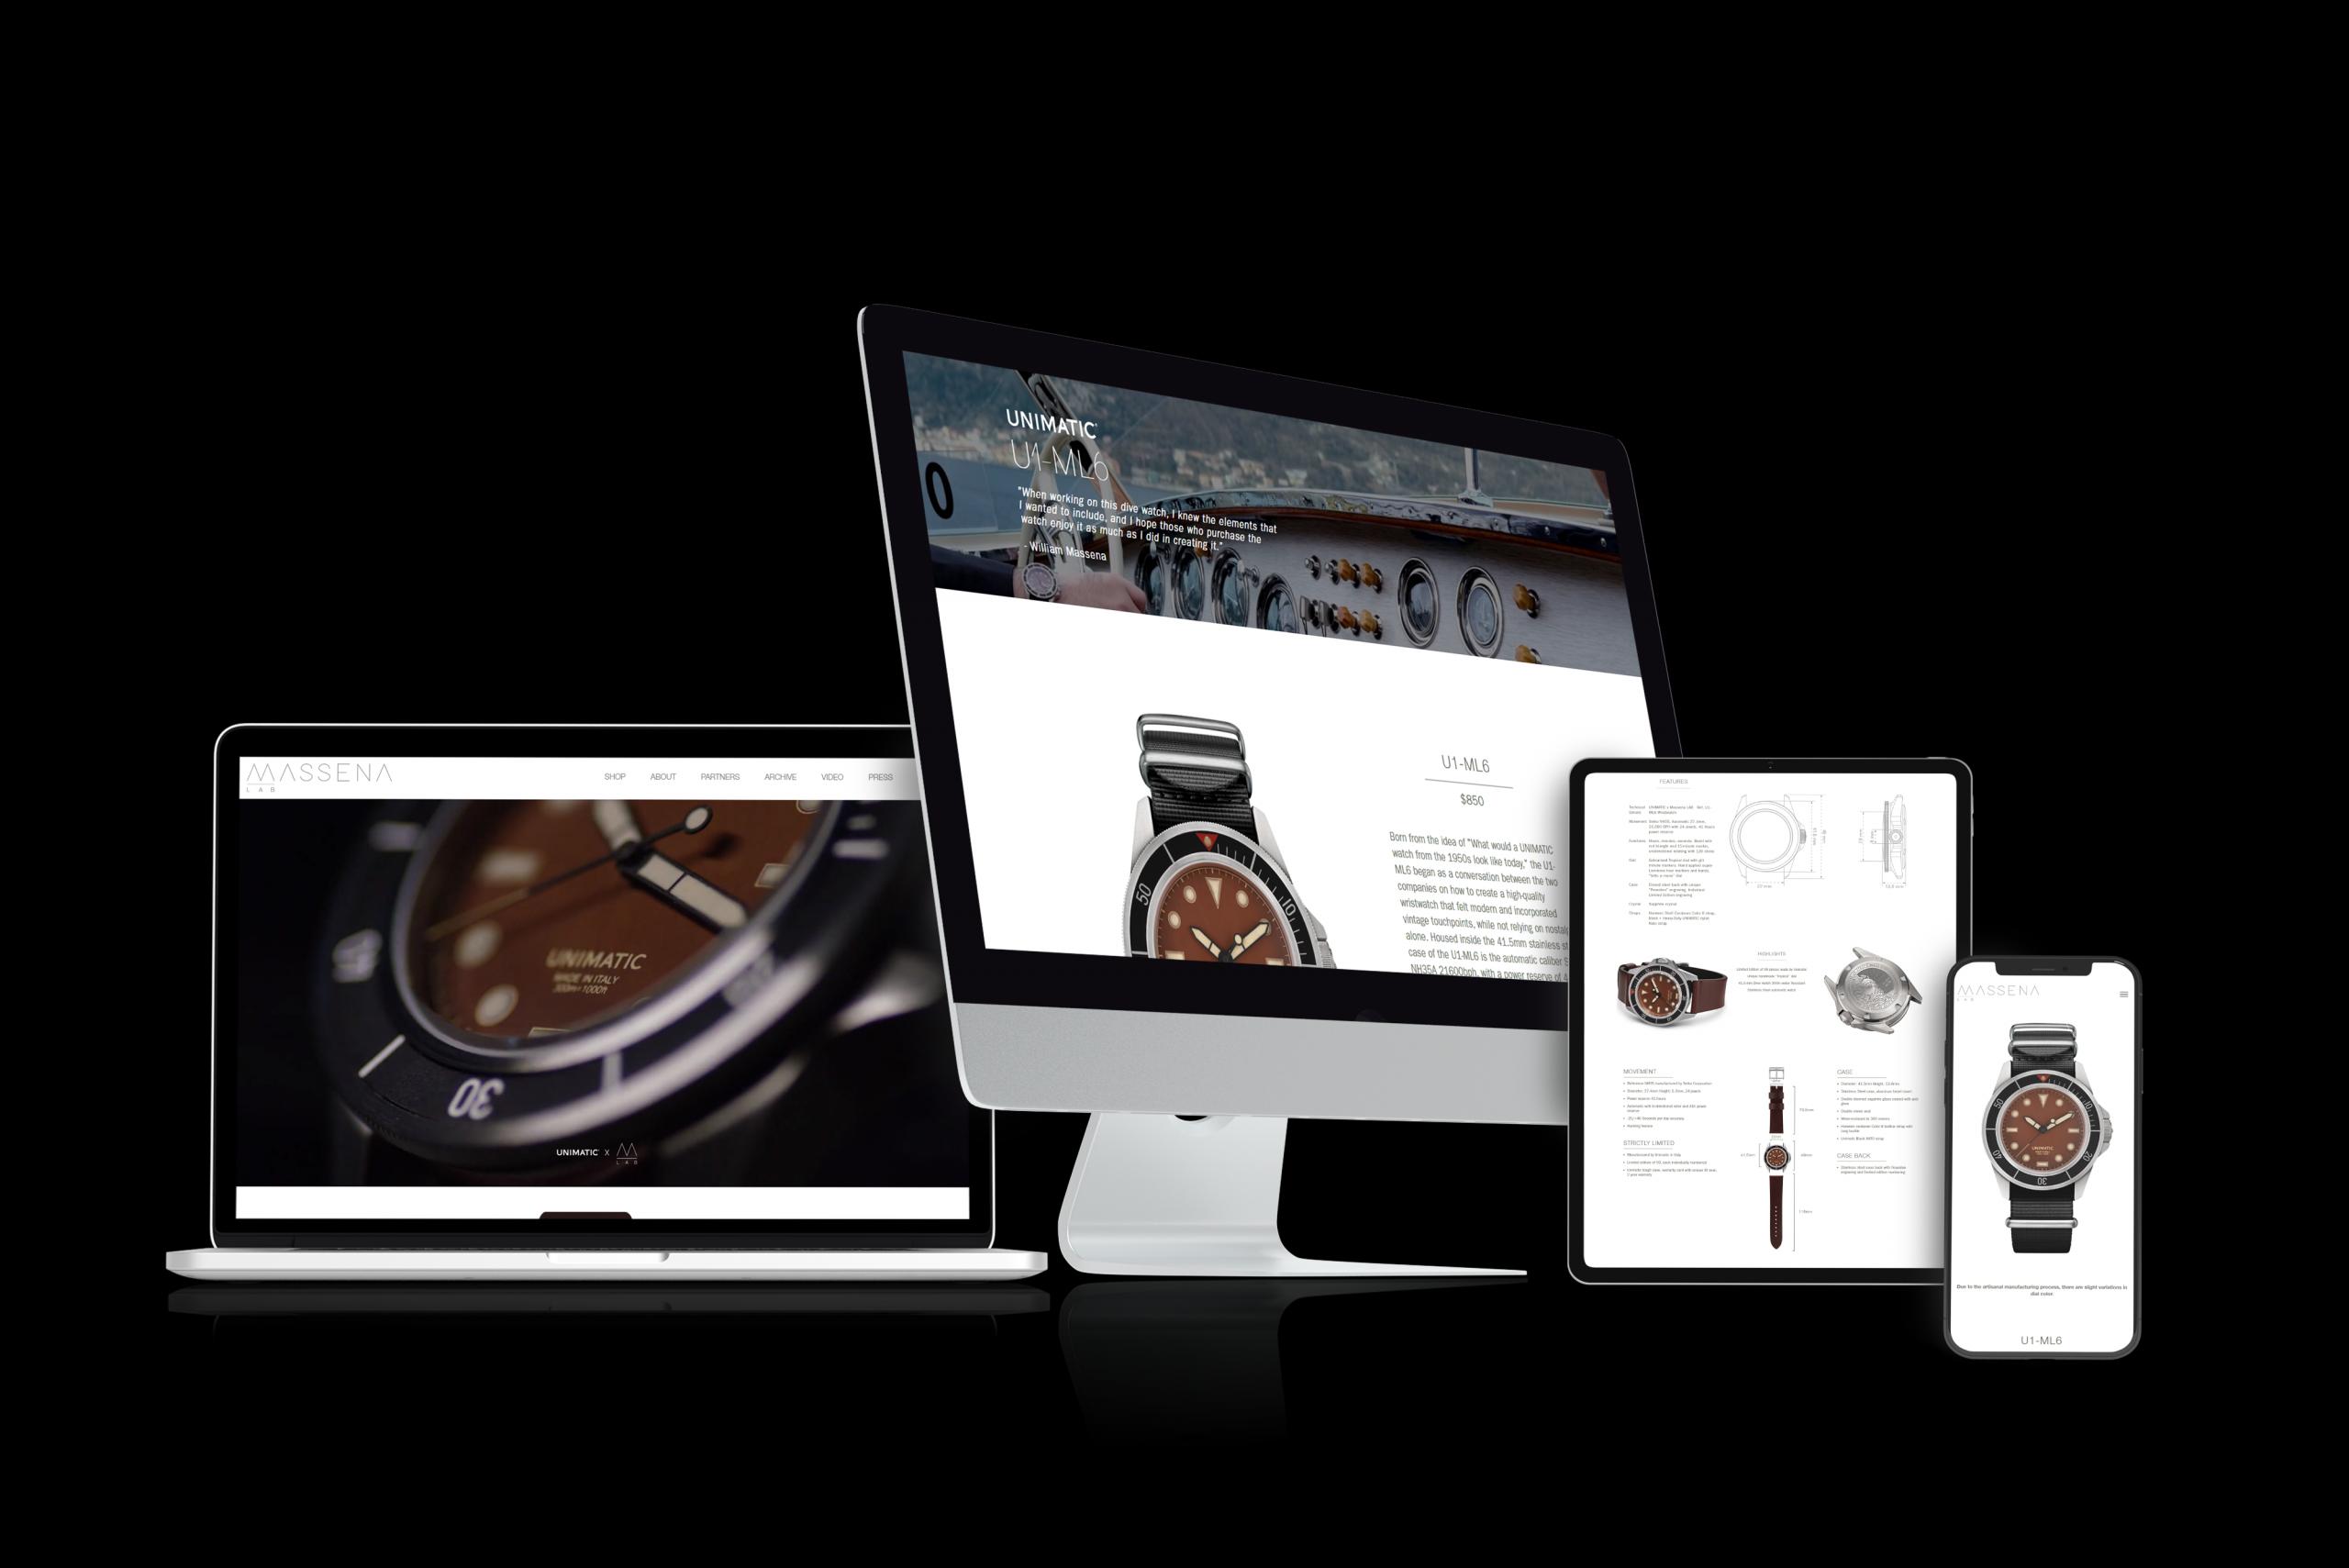 Massena LAB - Branding, Web Design & Development